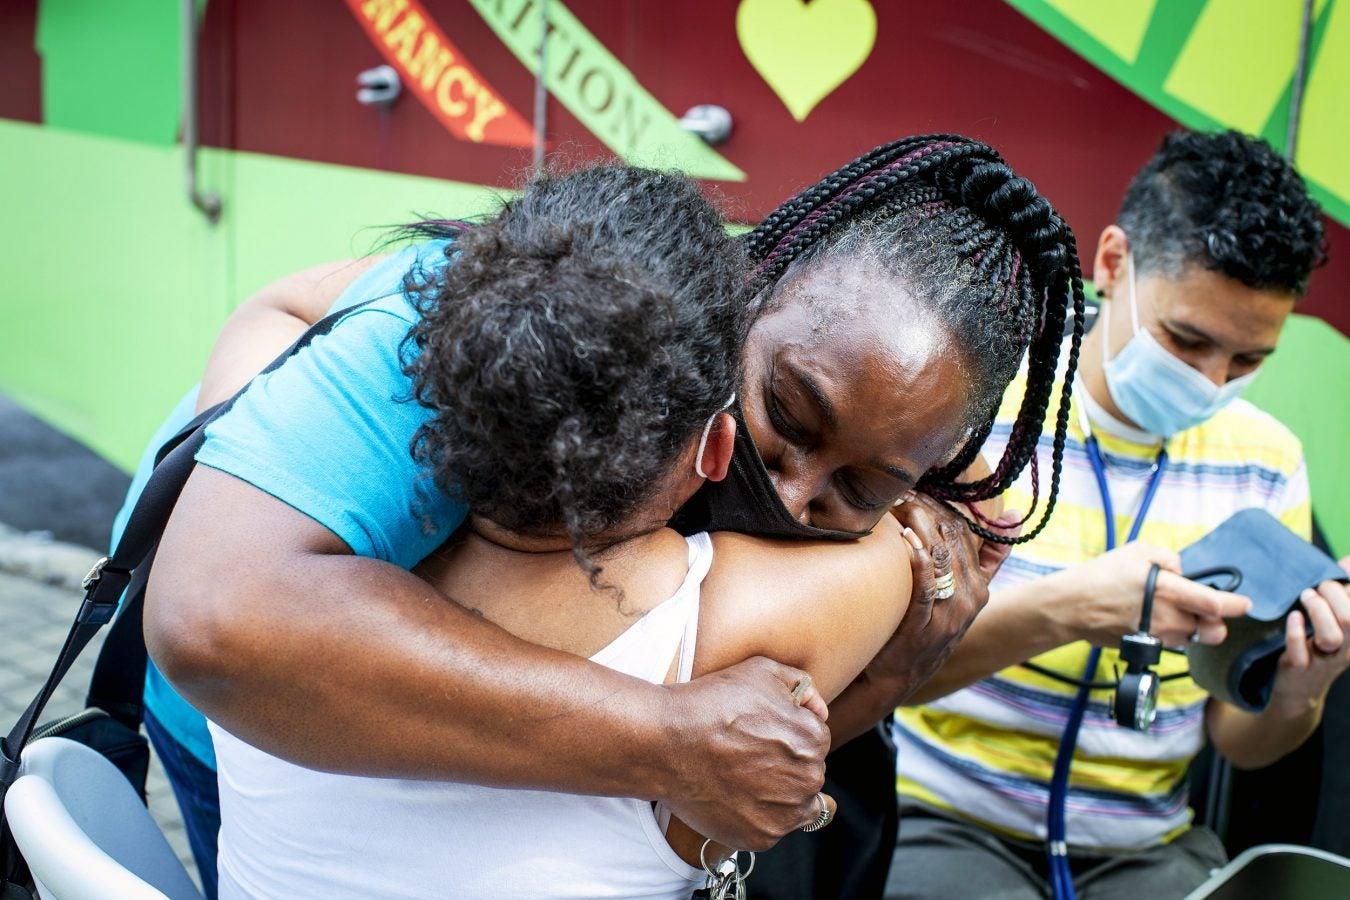 Assistant Director, Rainelle Walker White (facing camera) heartily greets fellow staffer, Joanne Suarez at Harvard University's Family Van.